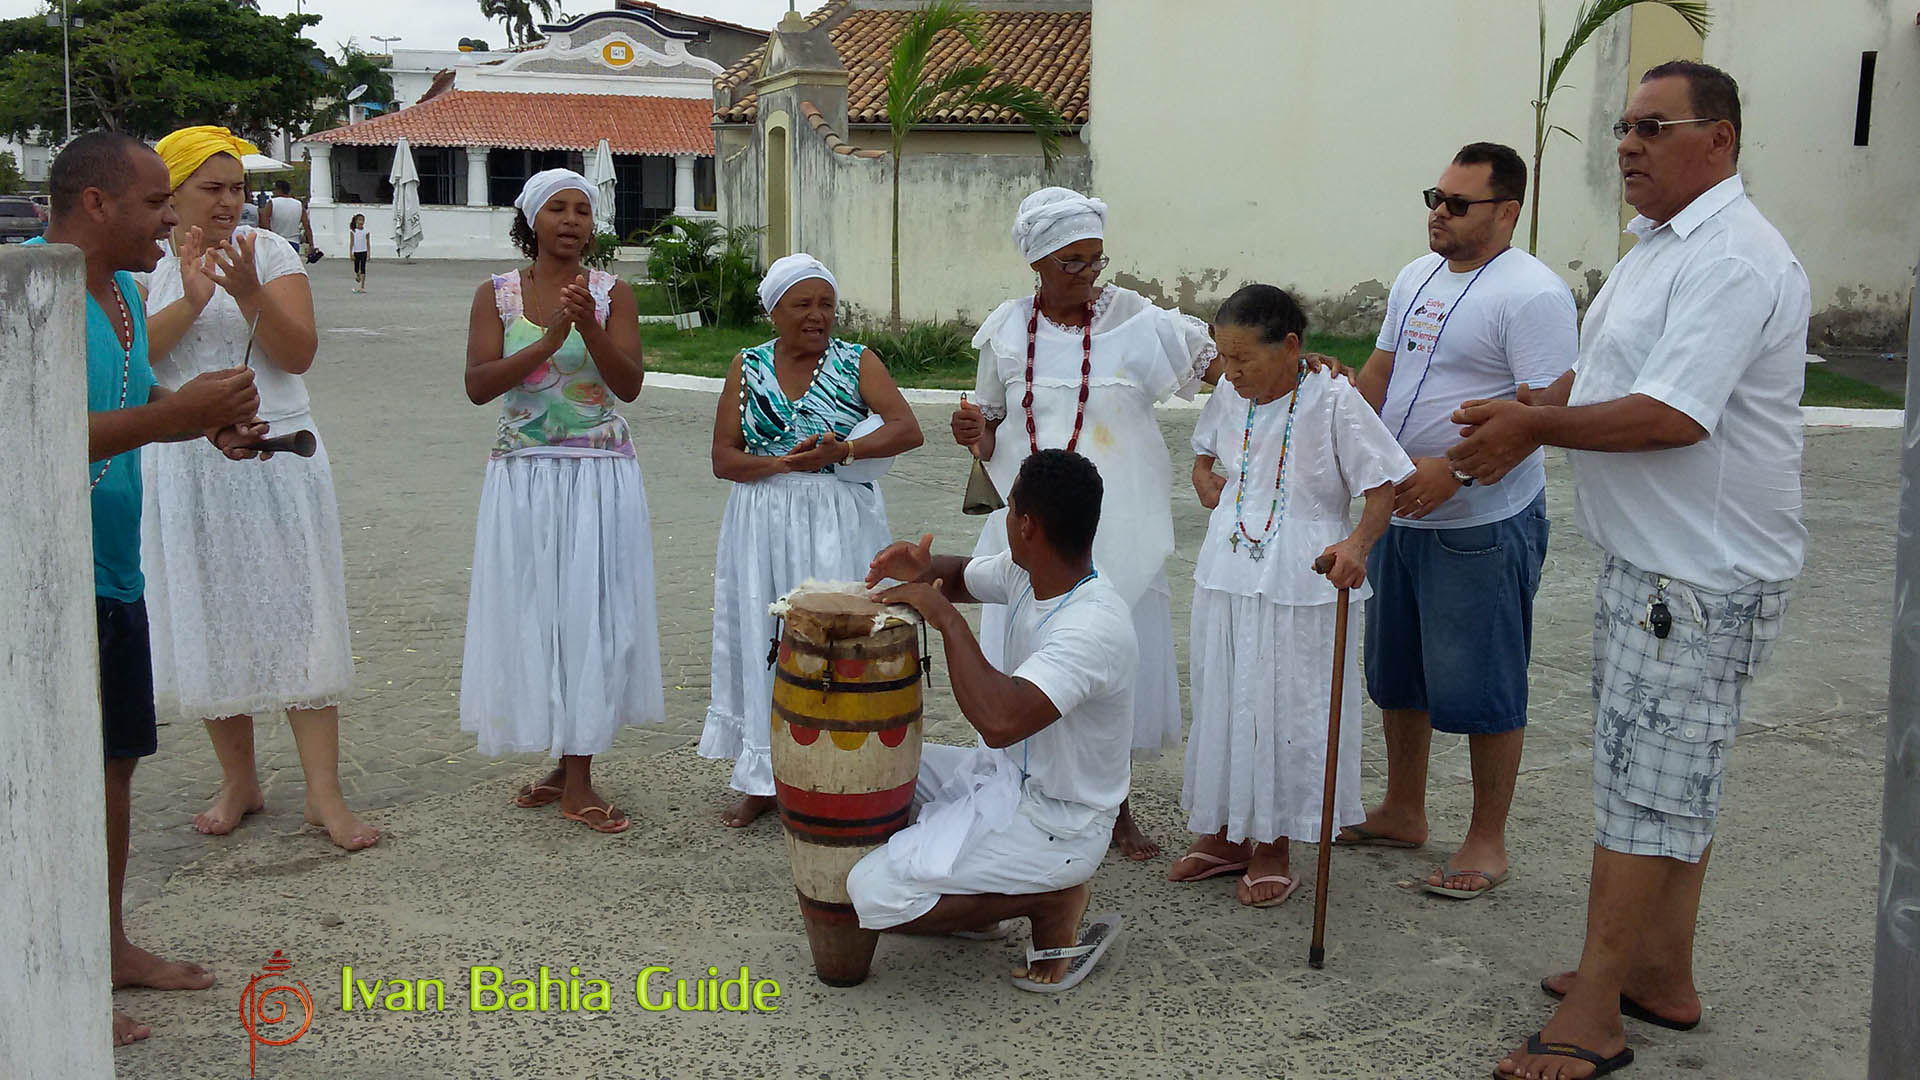 Ivan Bahia Guide, intimate Candomblé ceremonial